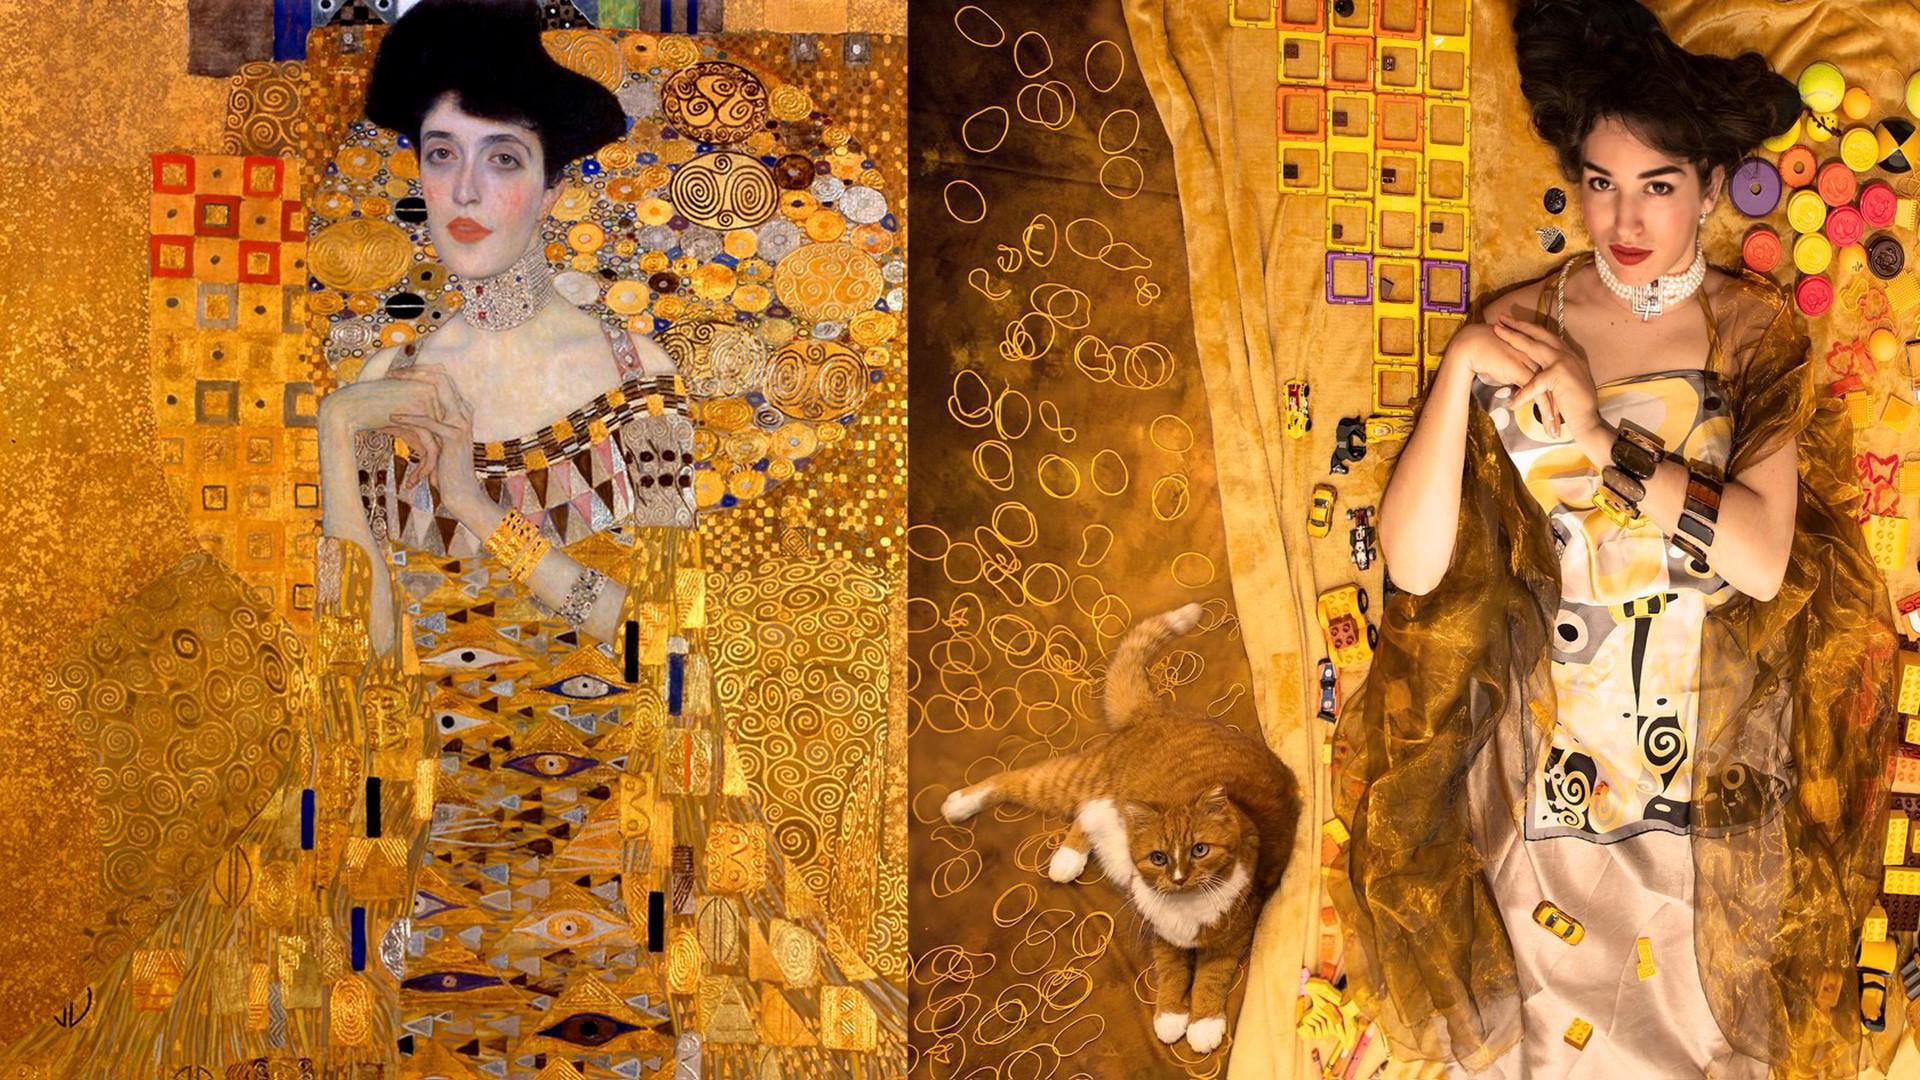 Gustav Klimt, Portrait d'Adele Bloch-Bauer I